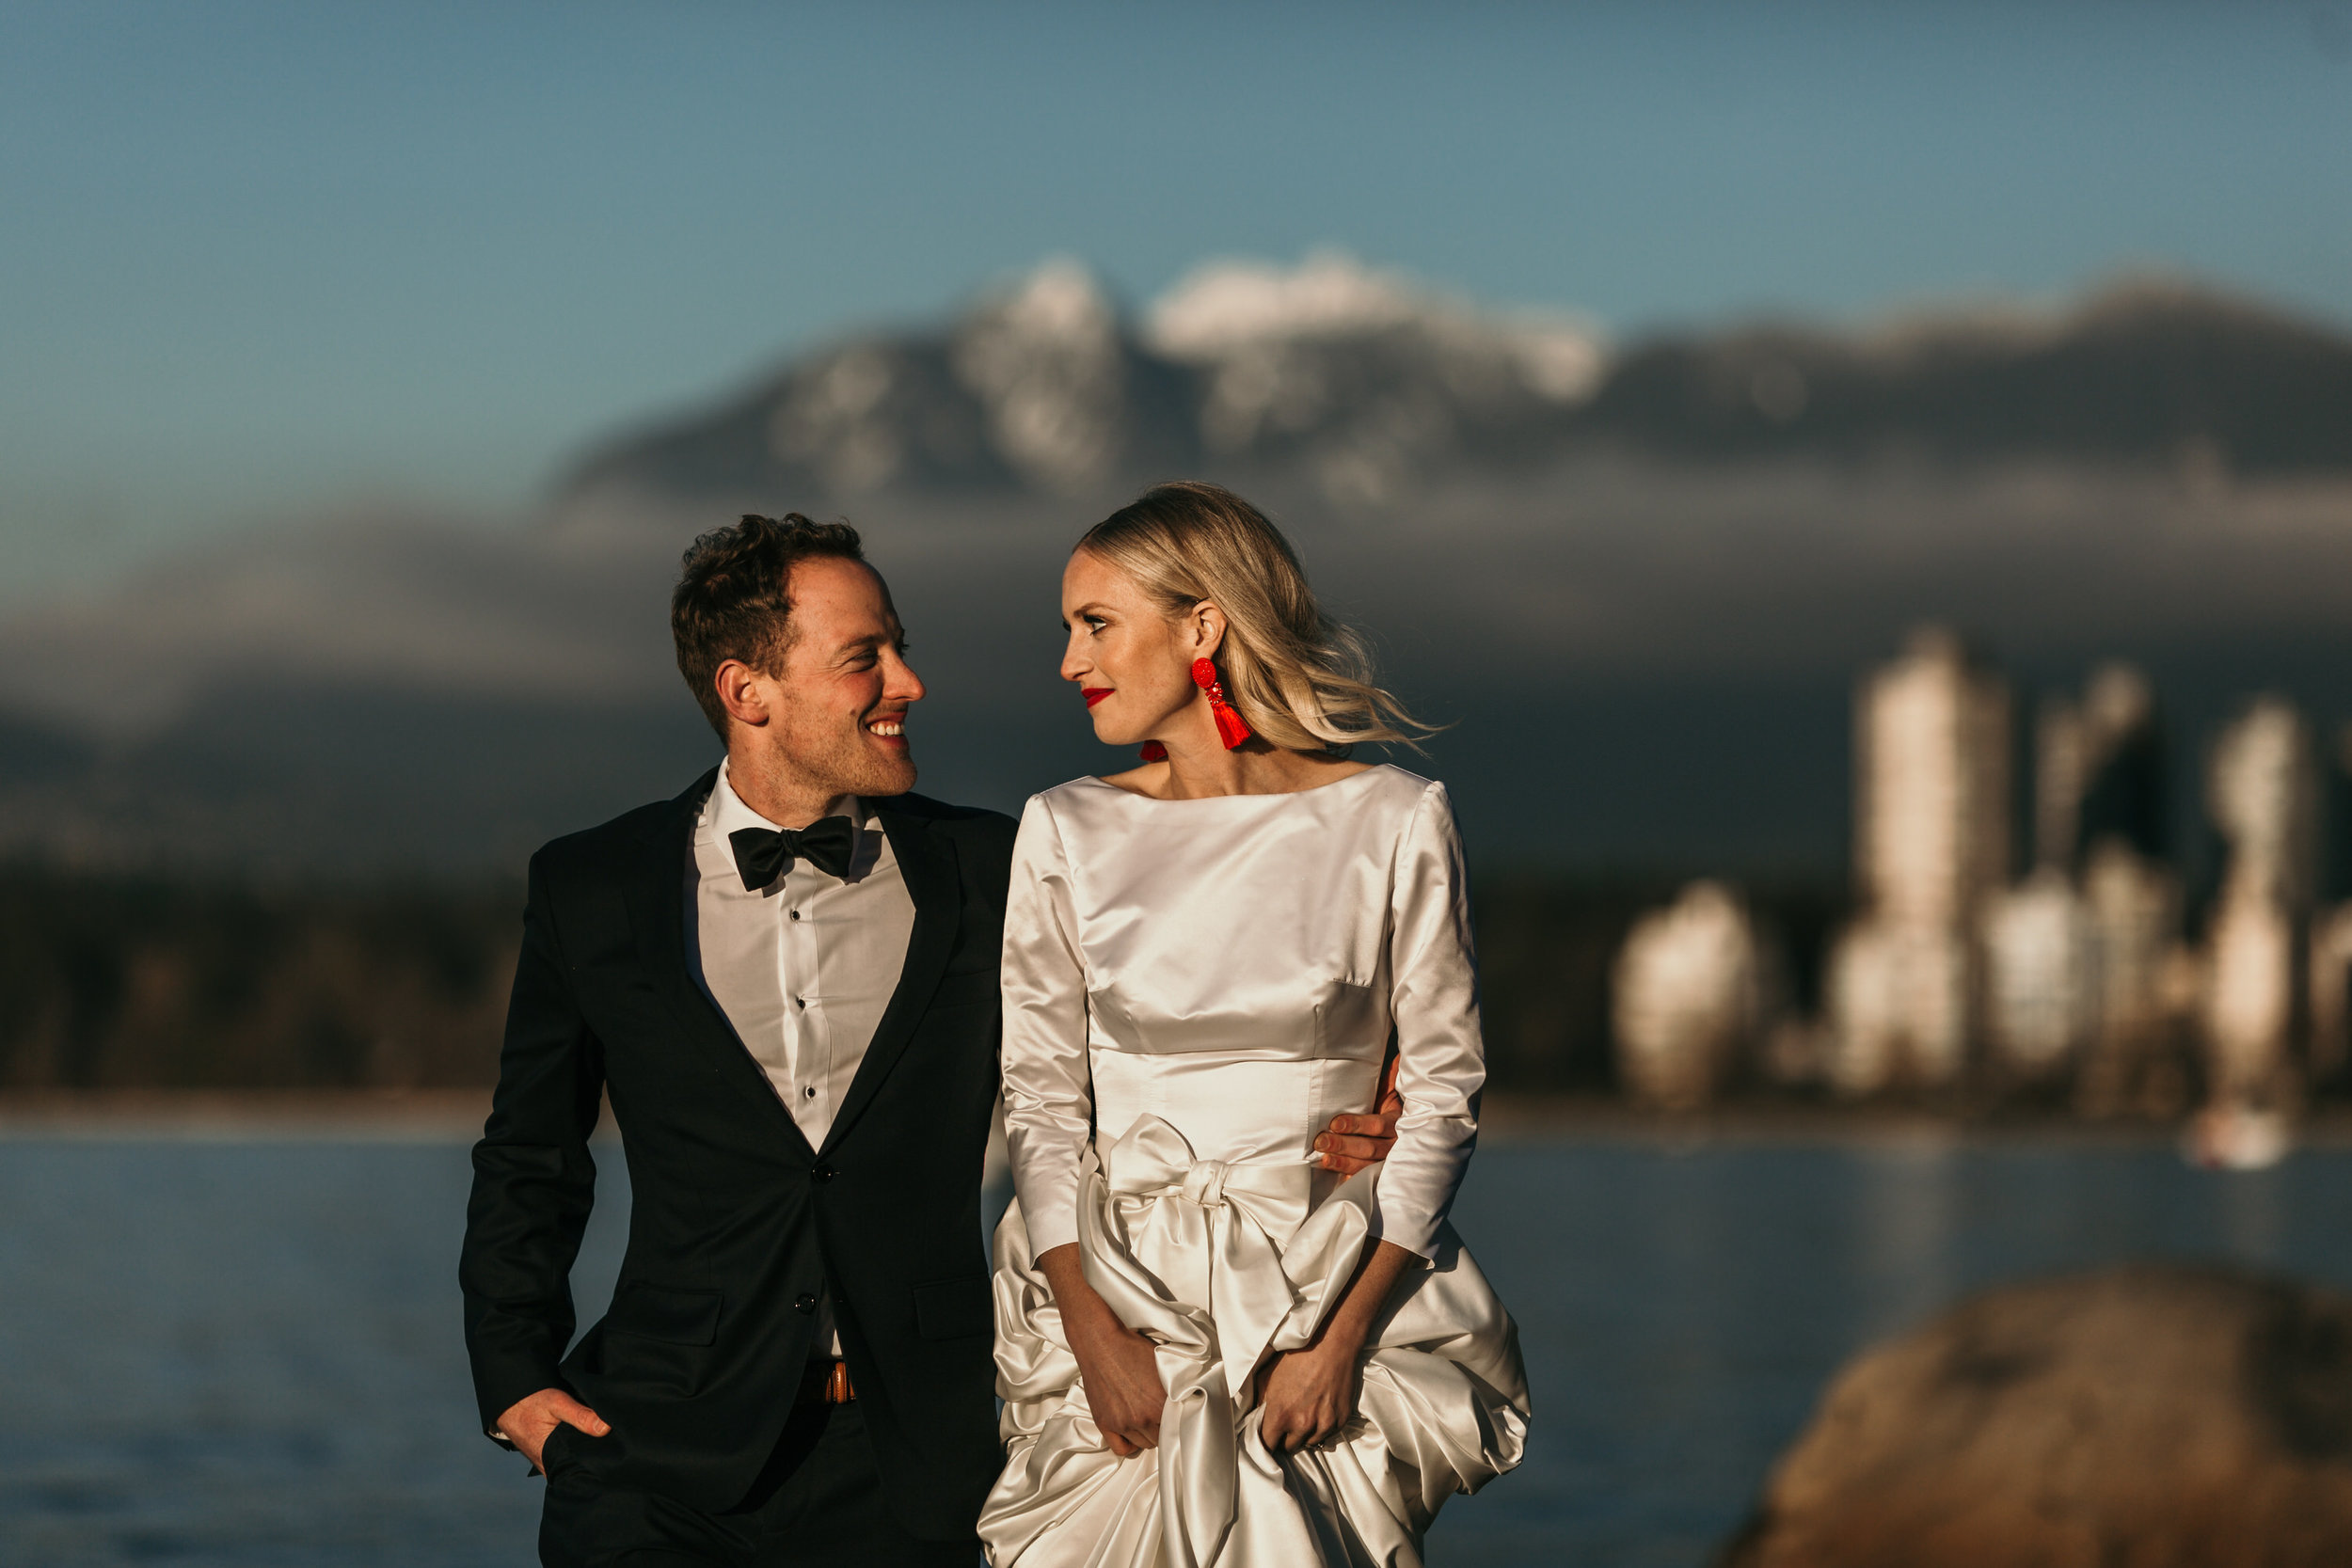 Vancouver Wedding Photos - Vegan Wedding Photographer - New Years Eve Wedding Photos - Vancouver Wedding Photographer - Vancouver Wedding Videographer - 791.JPG